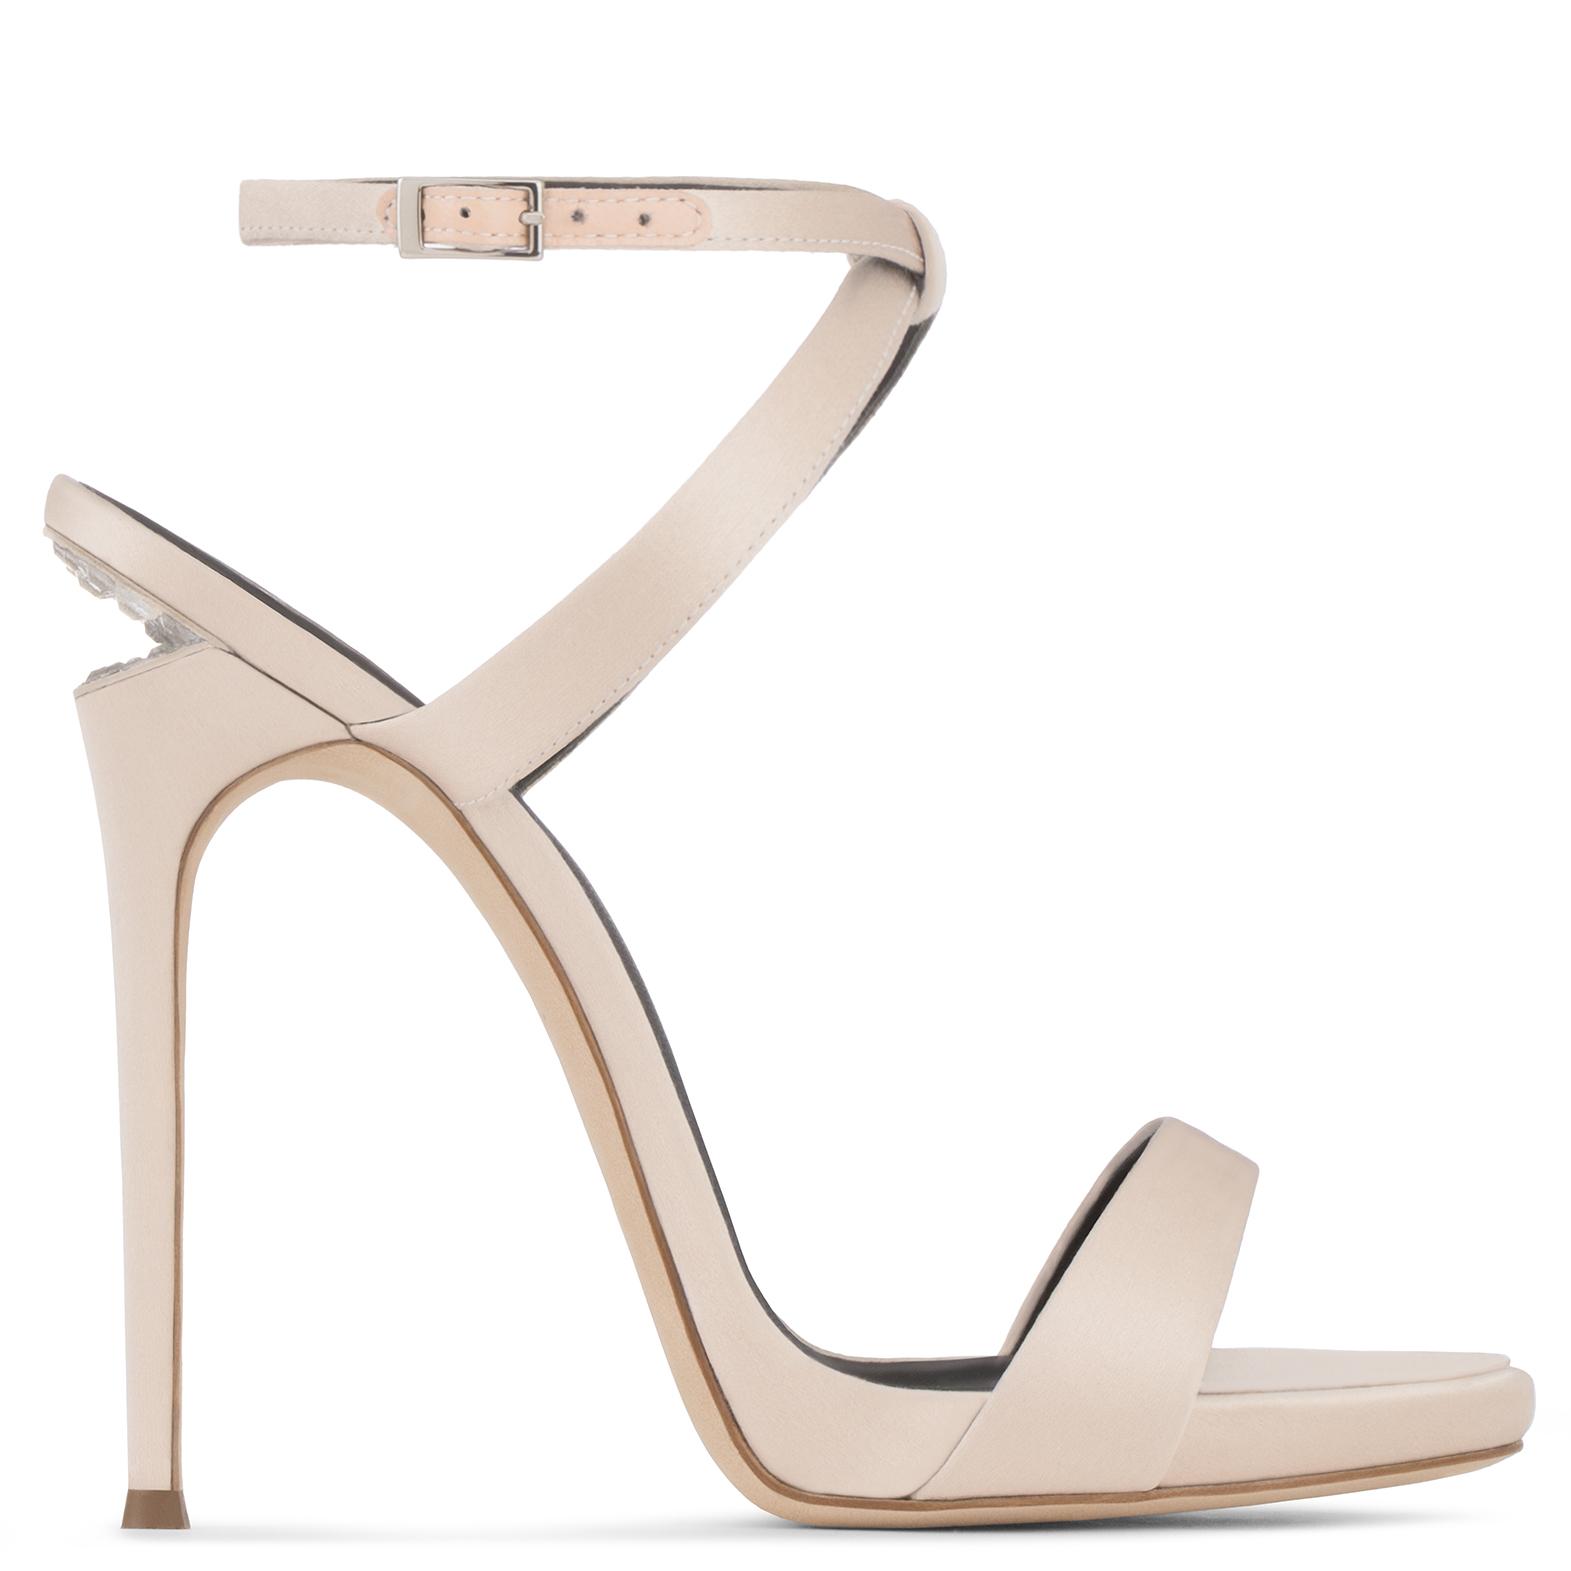 Dionne 12 - Sandals -   Giuseppe Zanotti ®